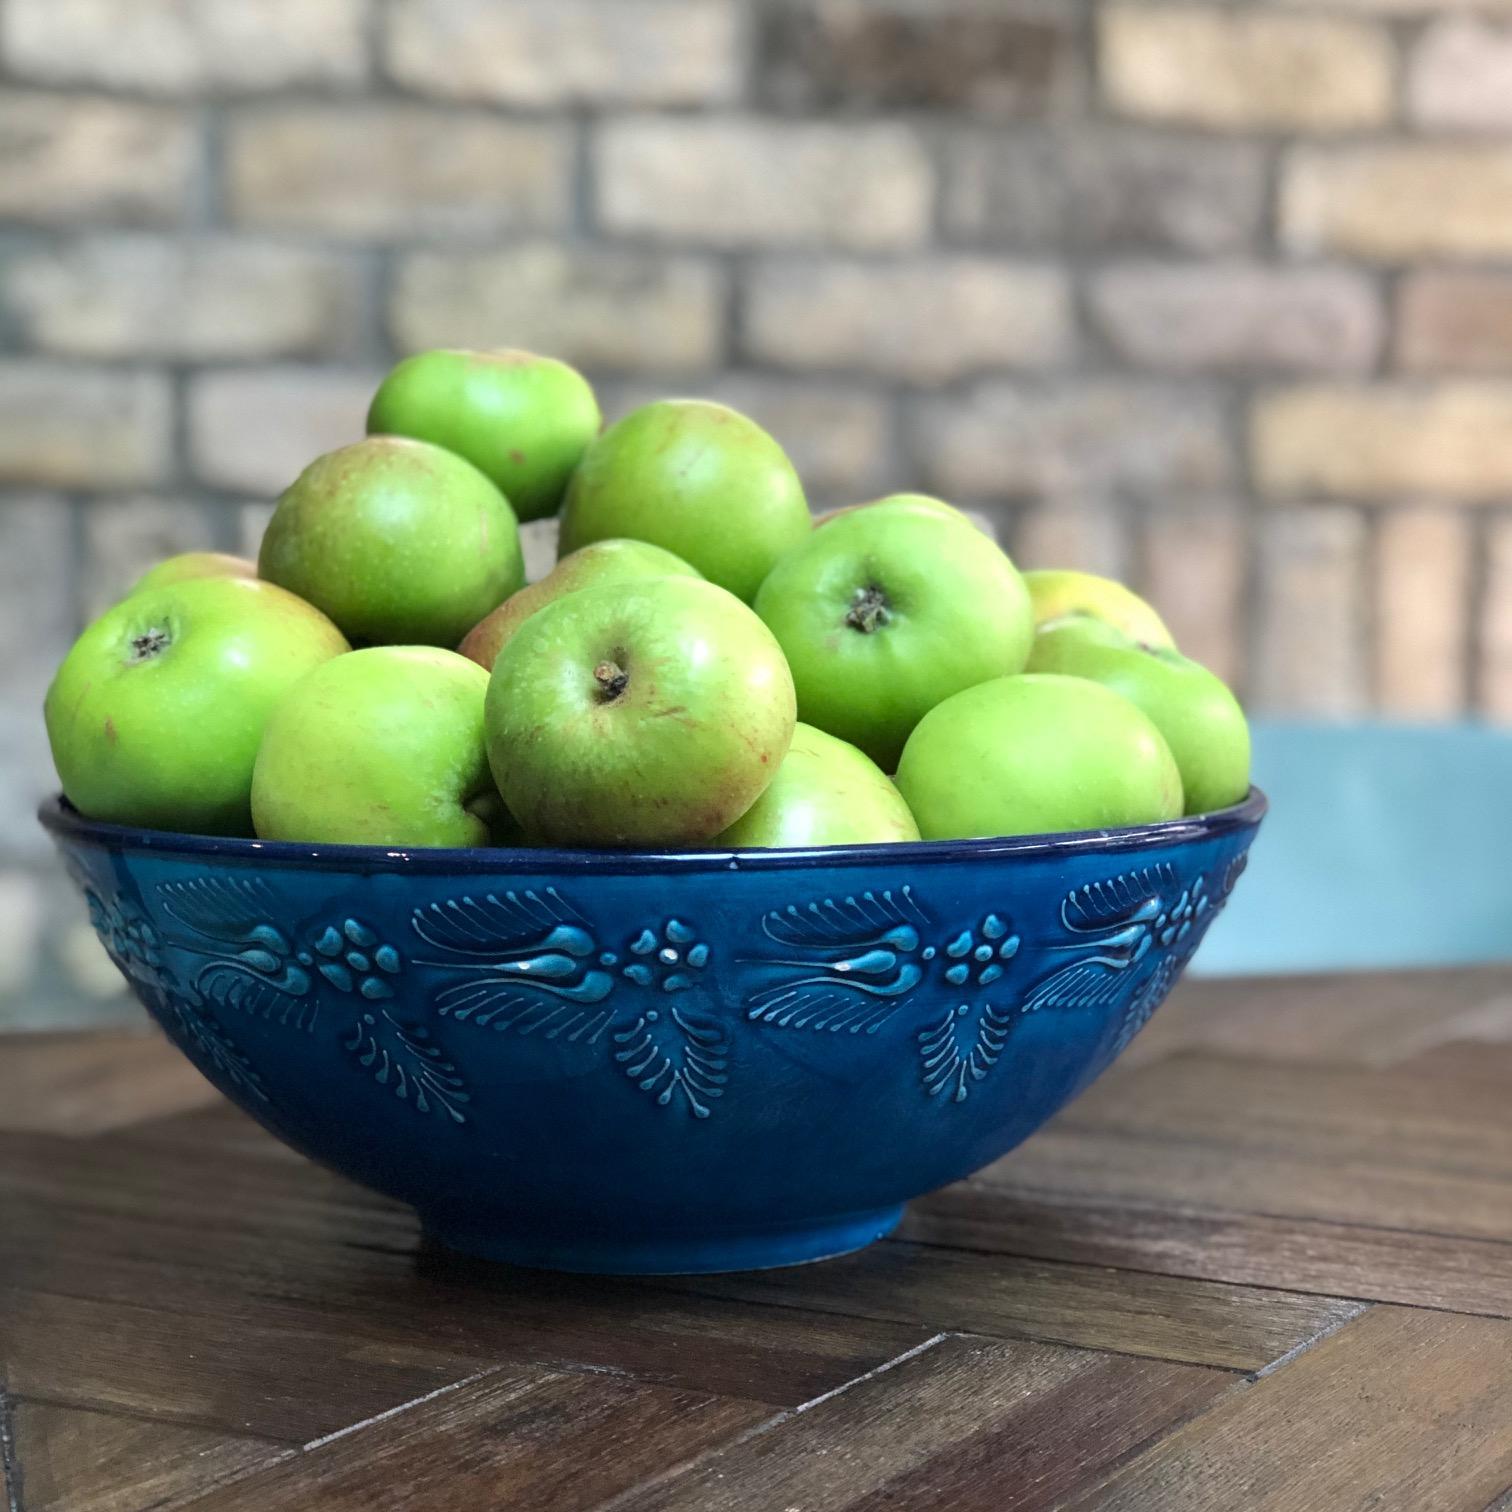 Homemade Apple Chutney